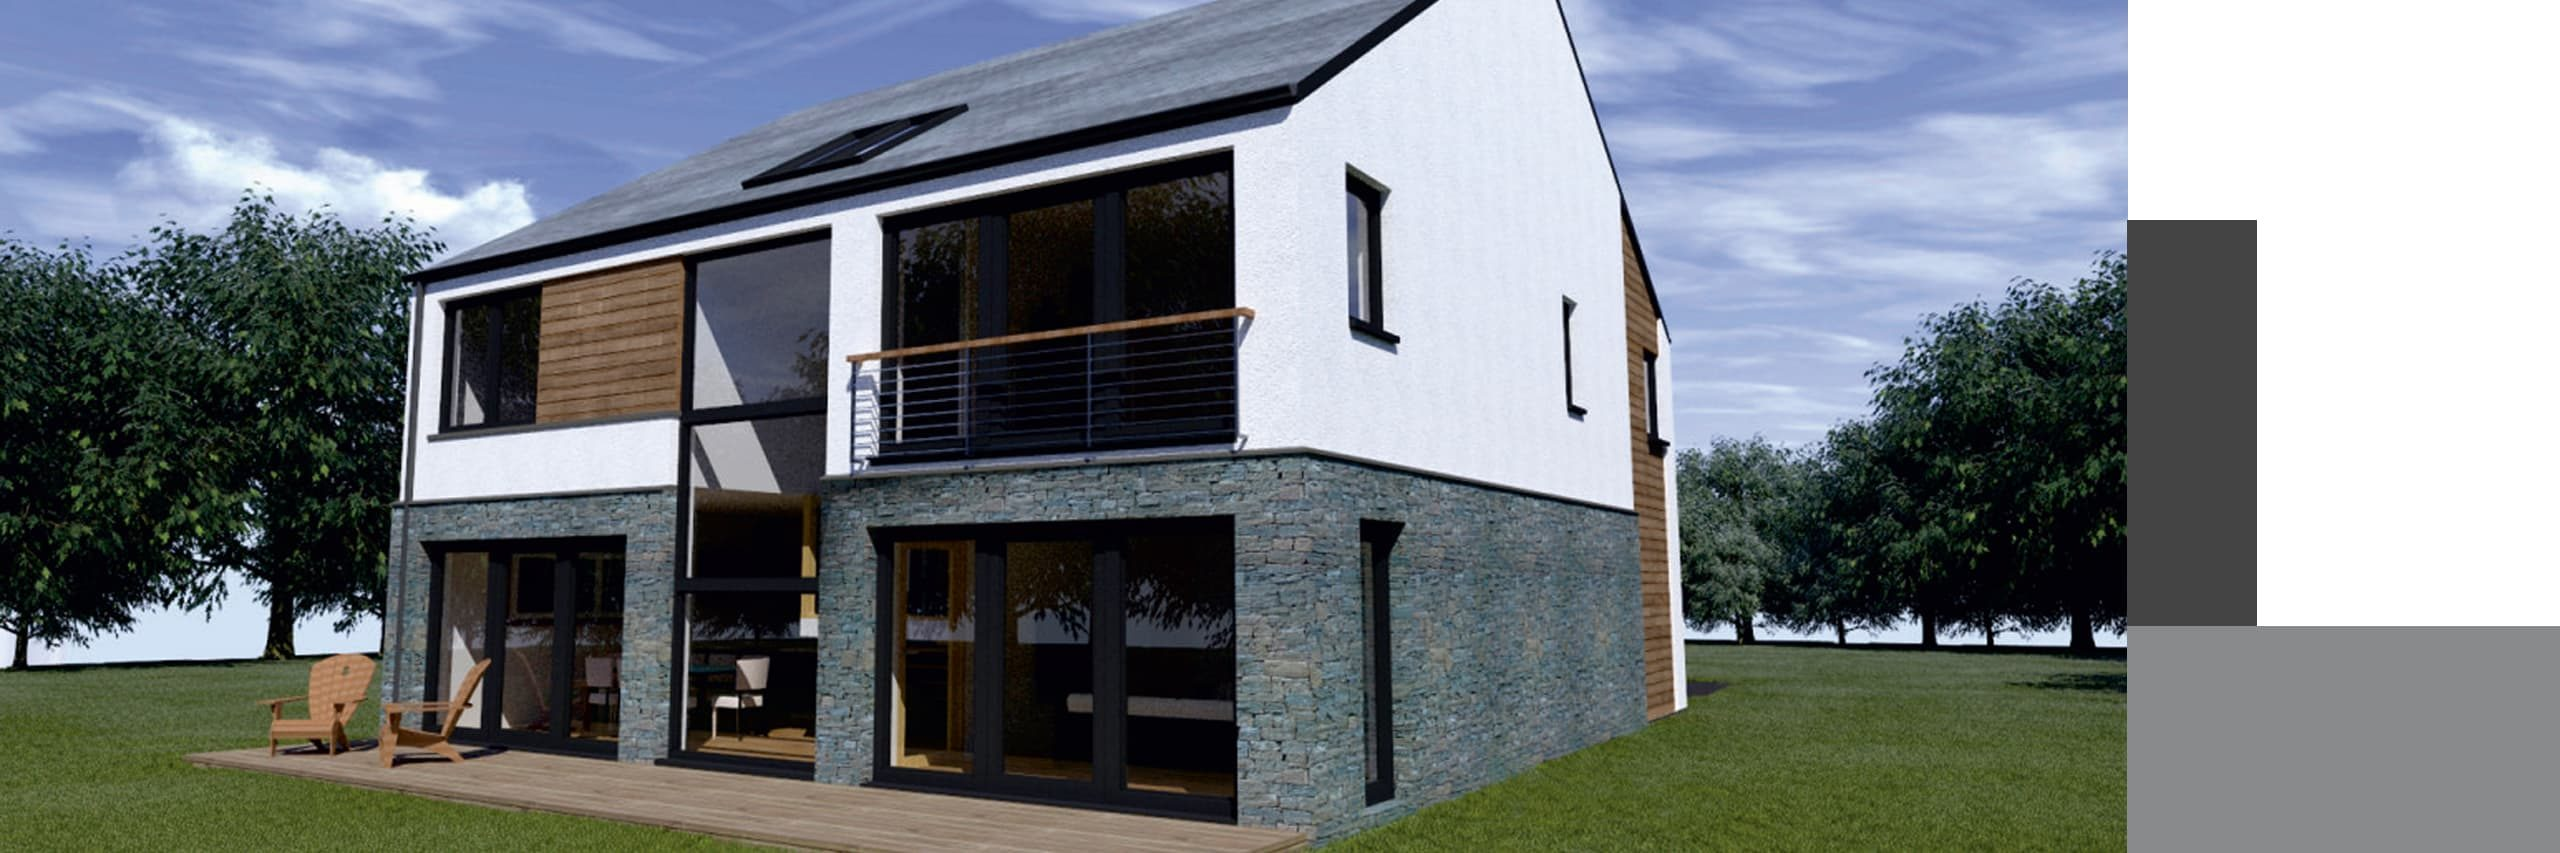 acharn self build home design